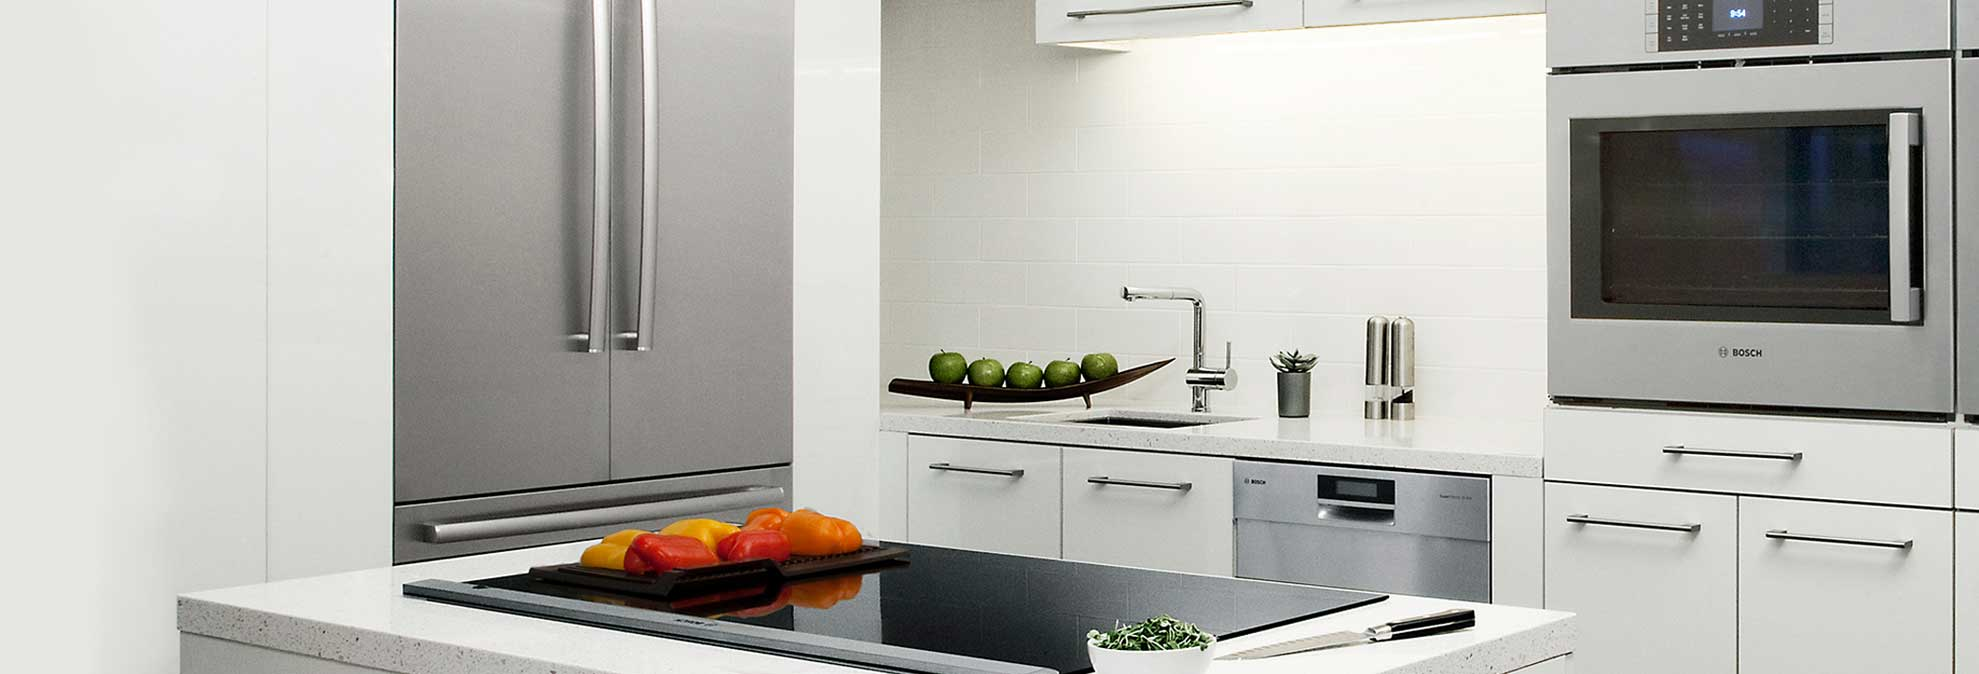 Wall oven under cooktop - Wall Oven Under Cooktop 14